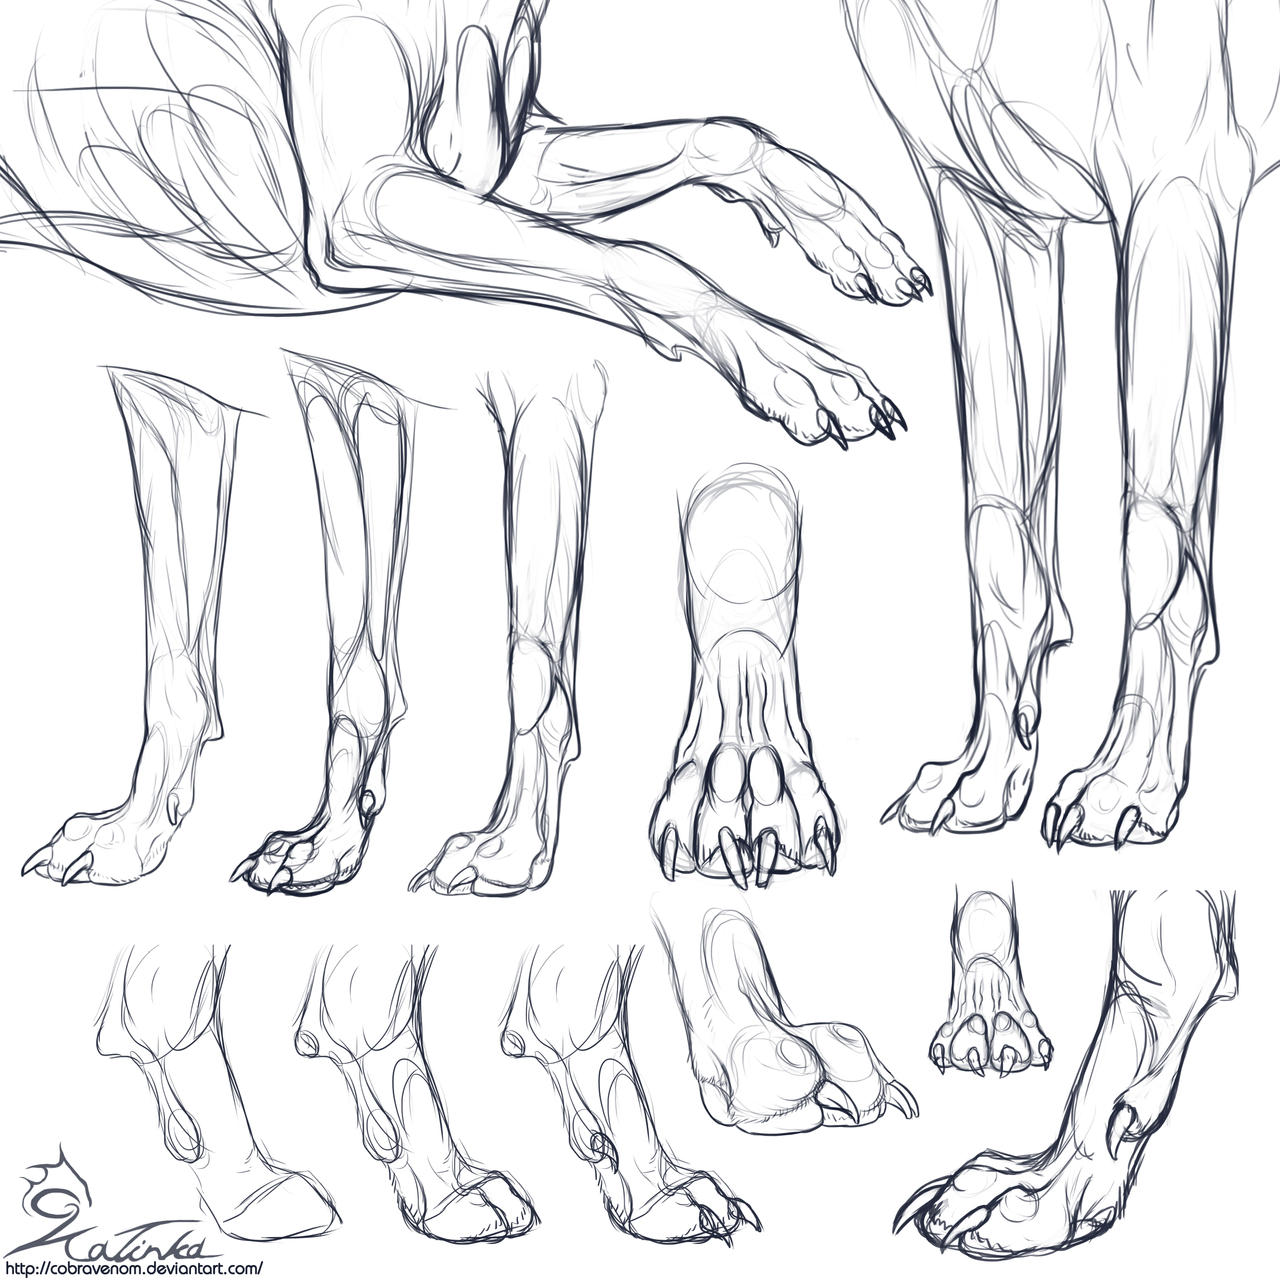 Study: Canine forepaws by CobraVenom